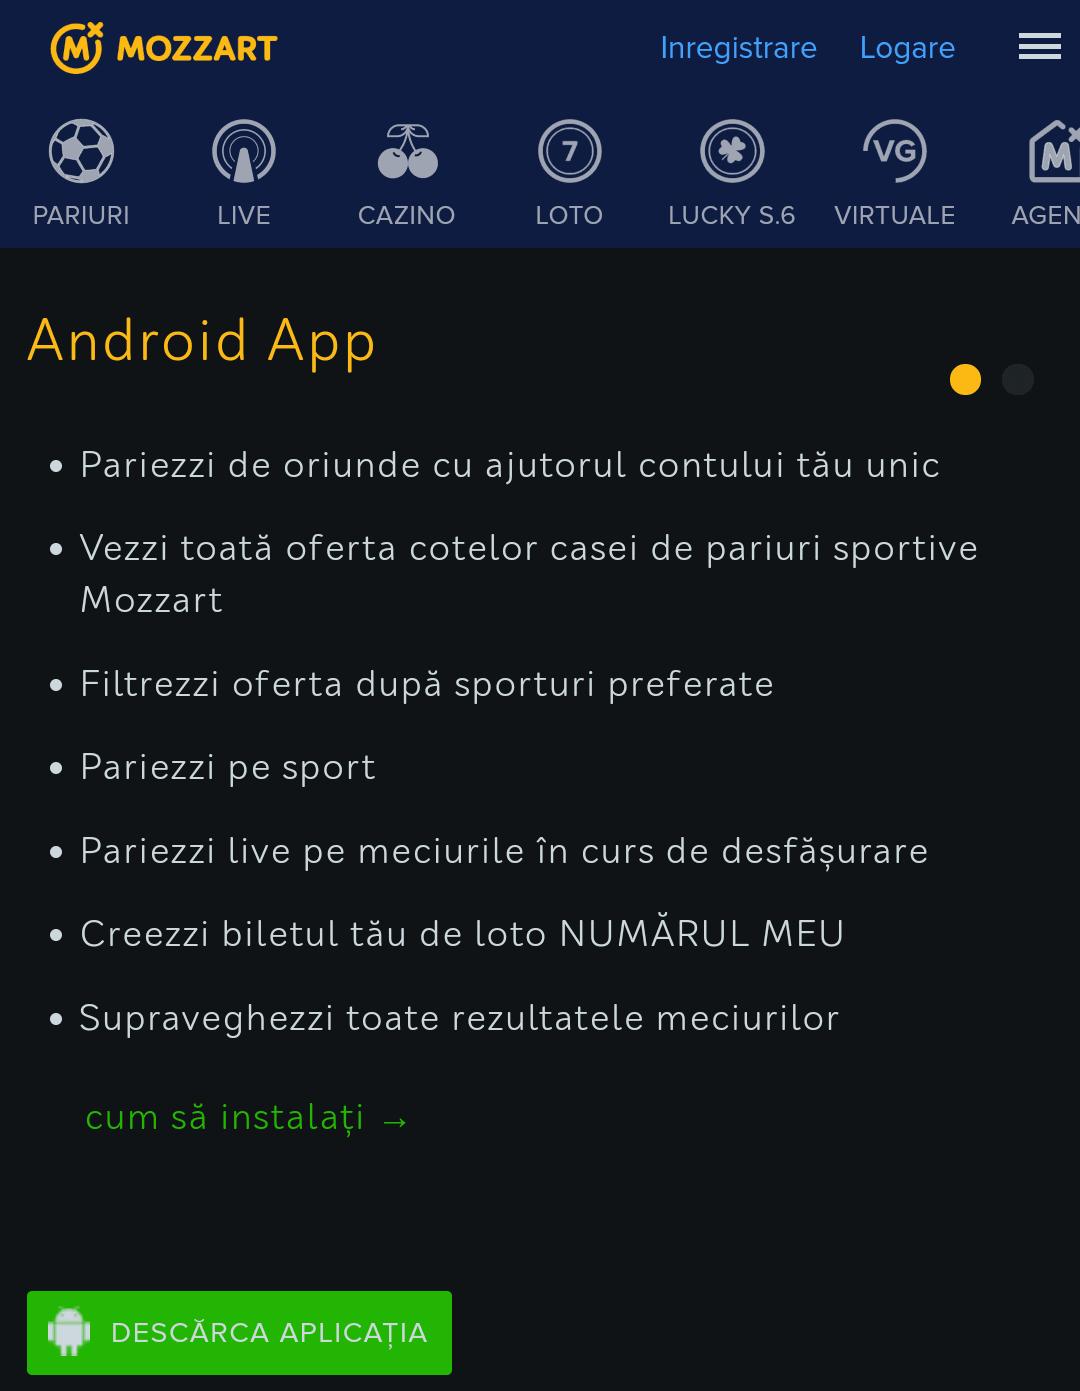 mozzart android app